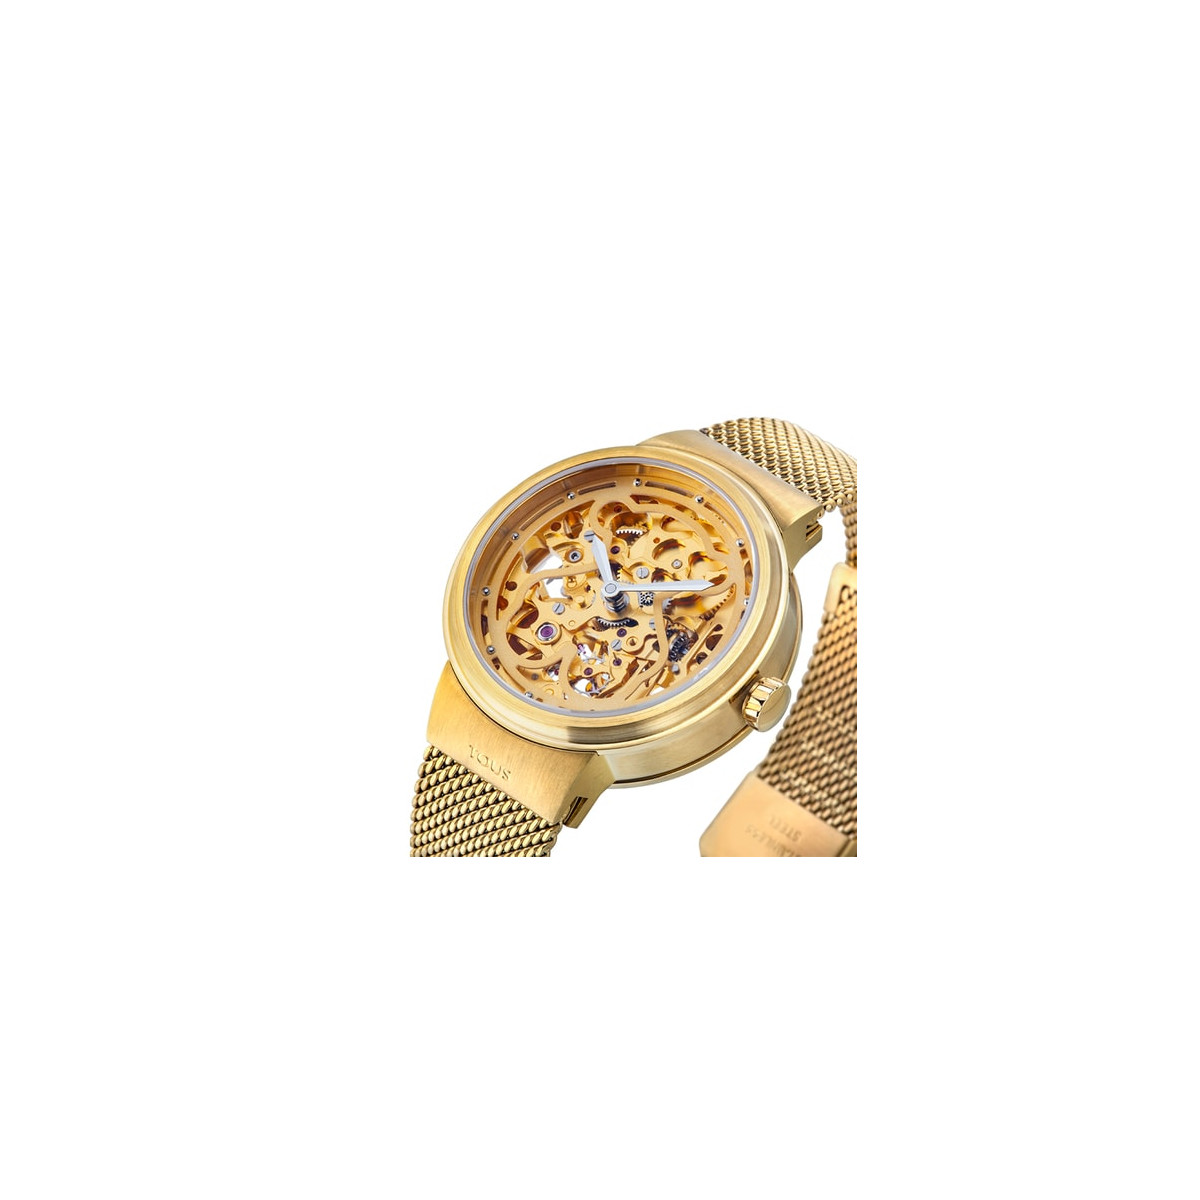 Reloj Tous Rond Automático 100350665